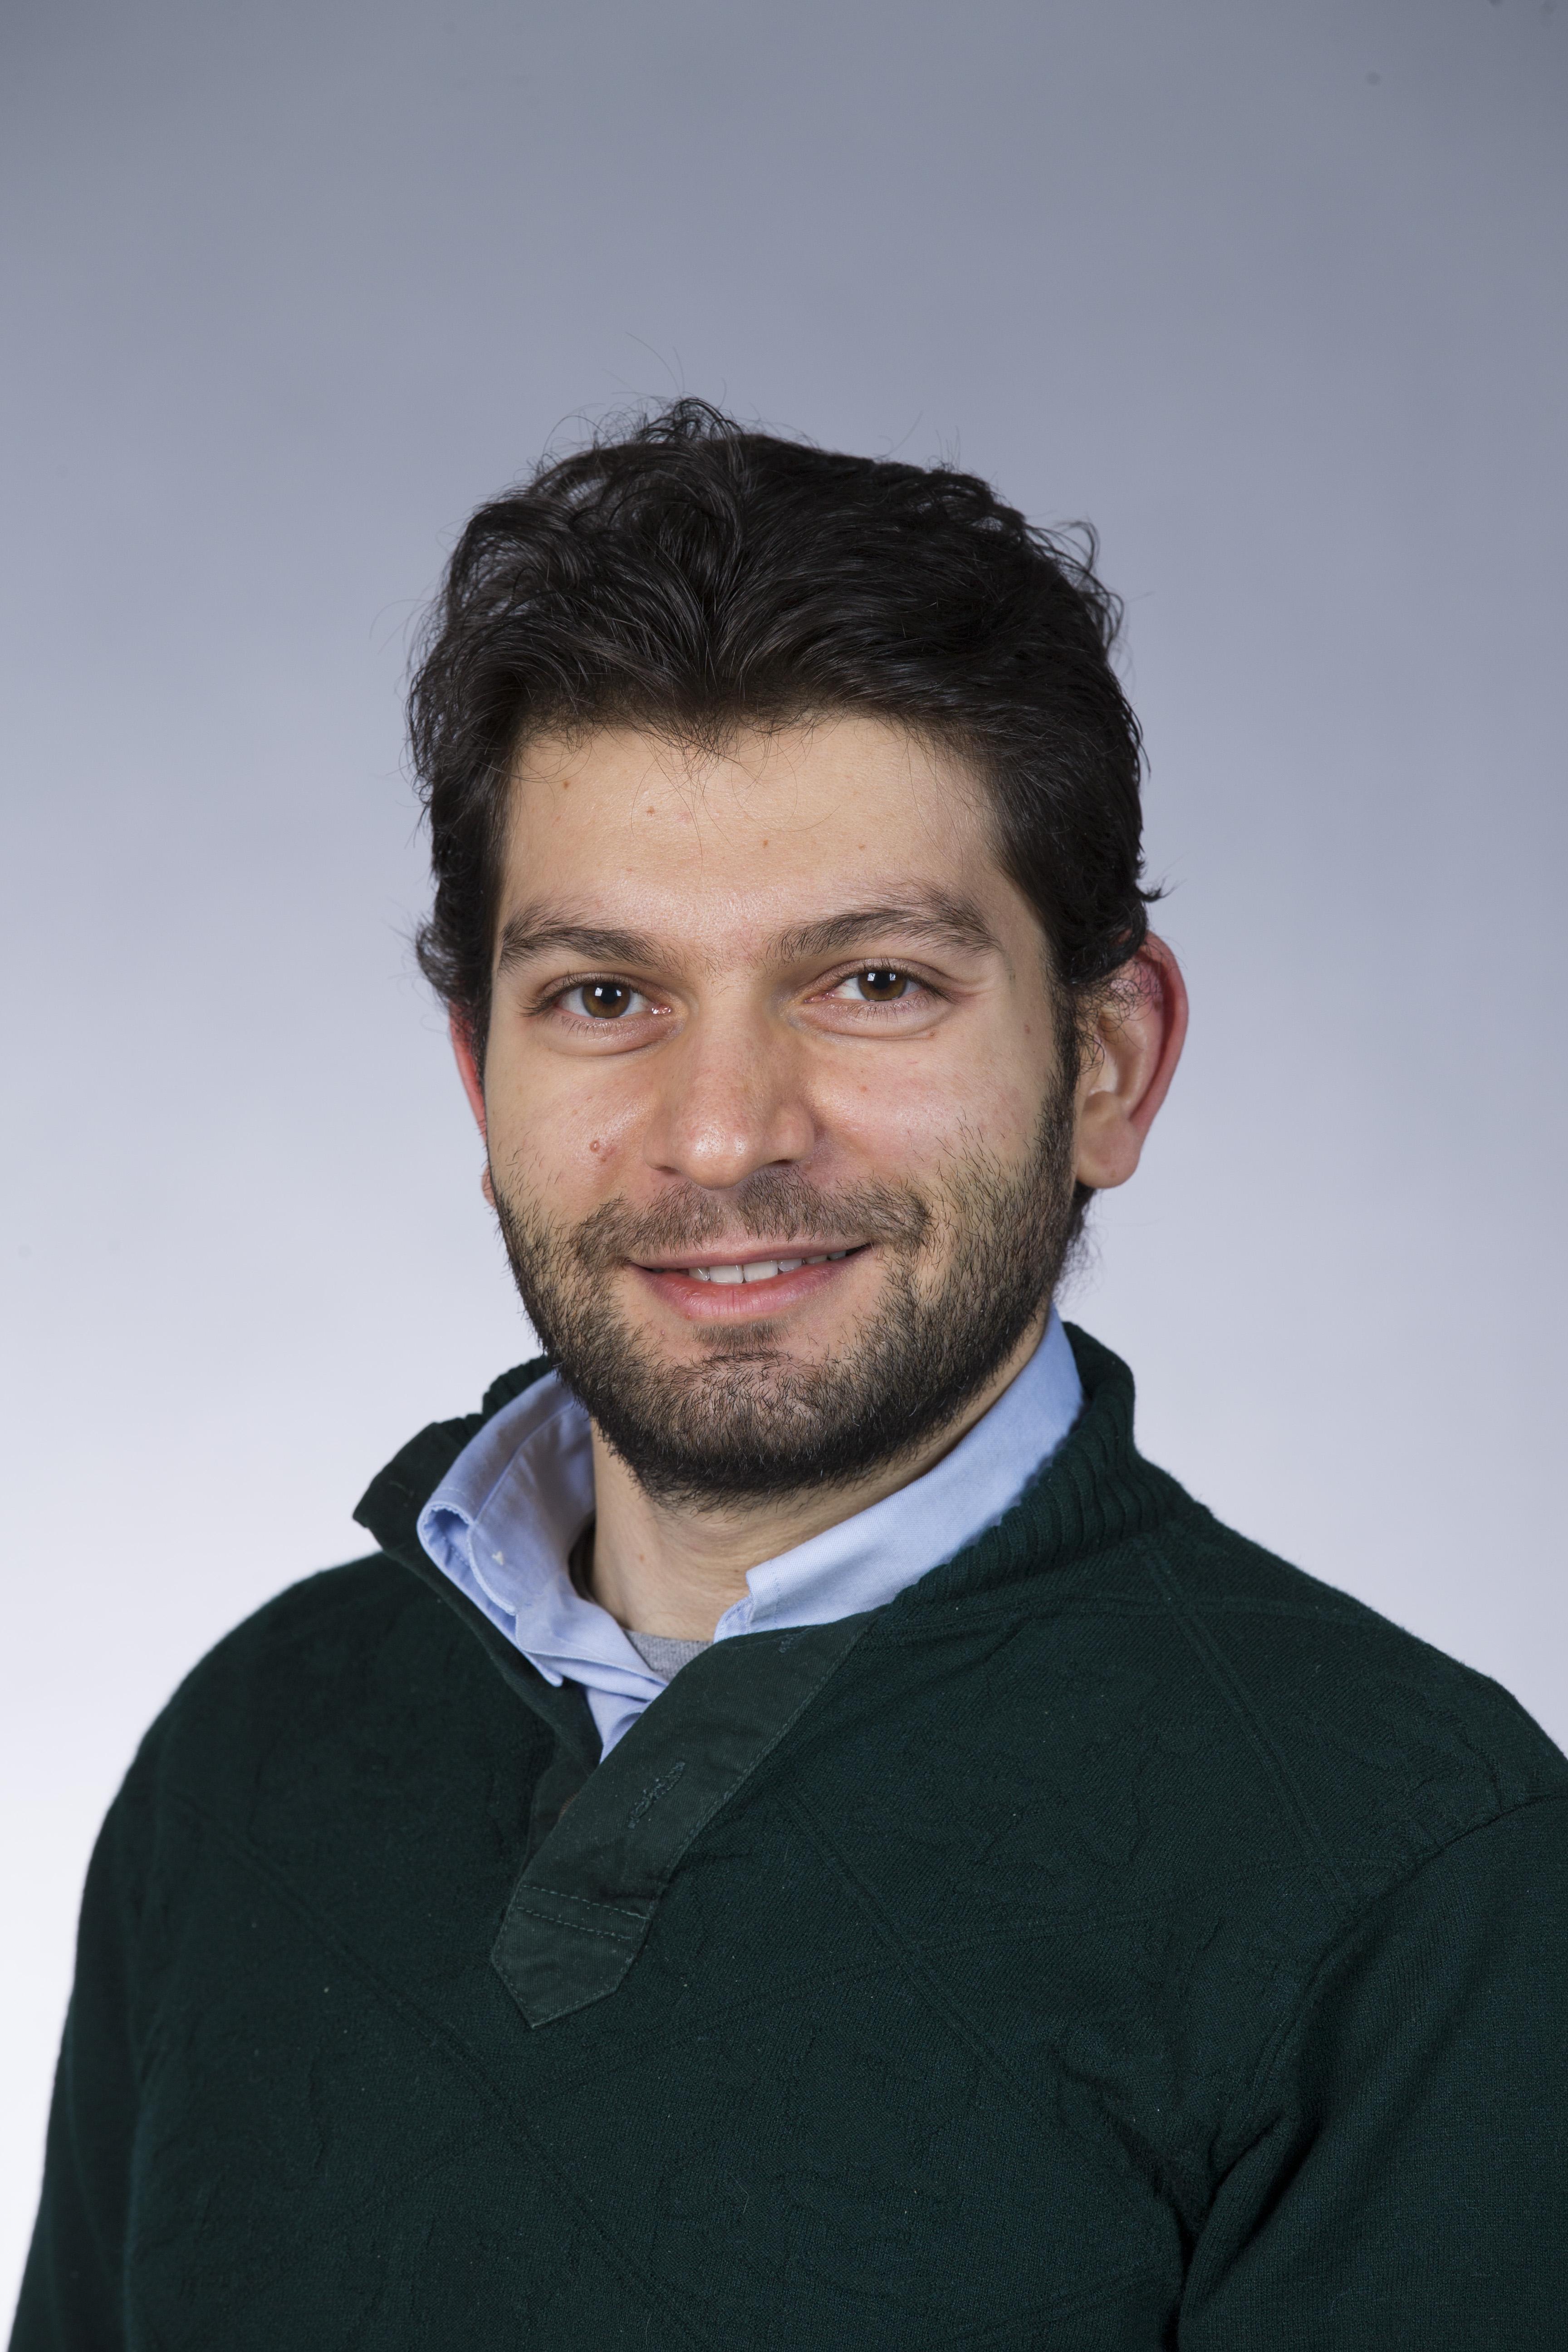 A headshot of Davit Potoyan